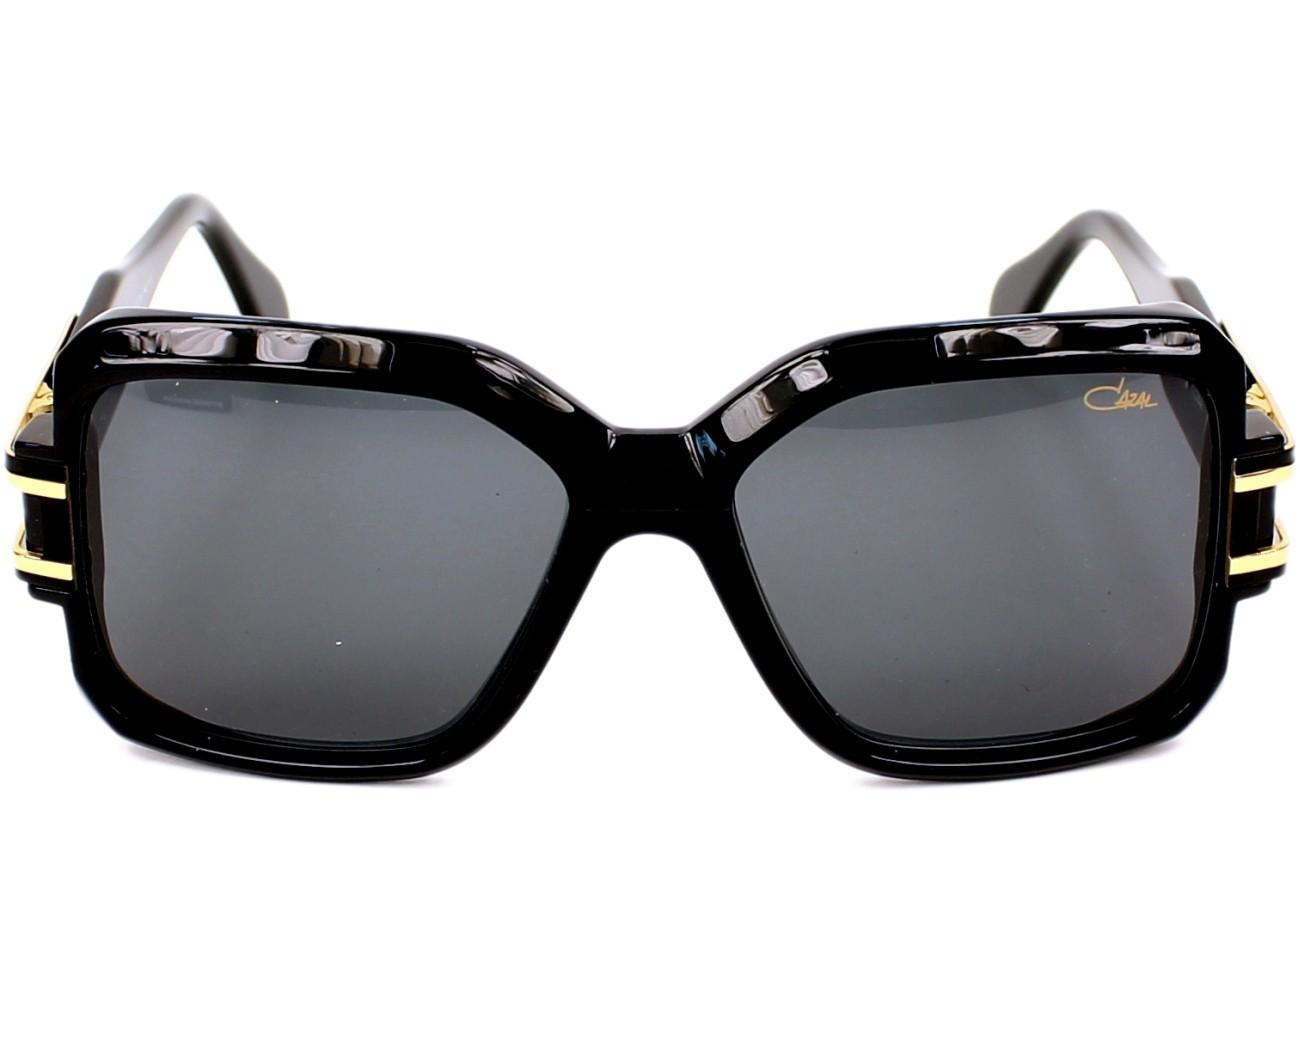 e97fe3485d1c Sunglasses cazal black gold front view jpg 1300x1040 Cazal 623